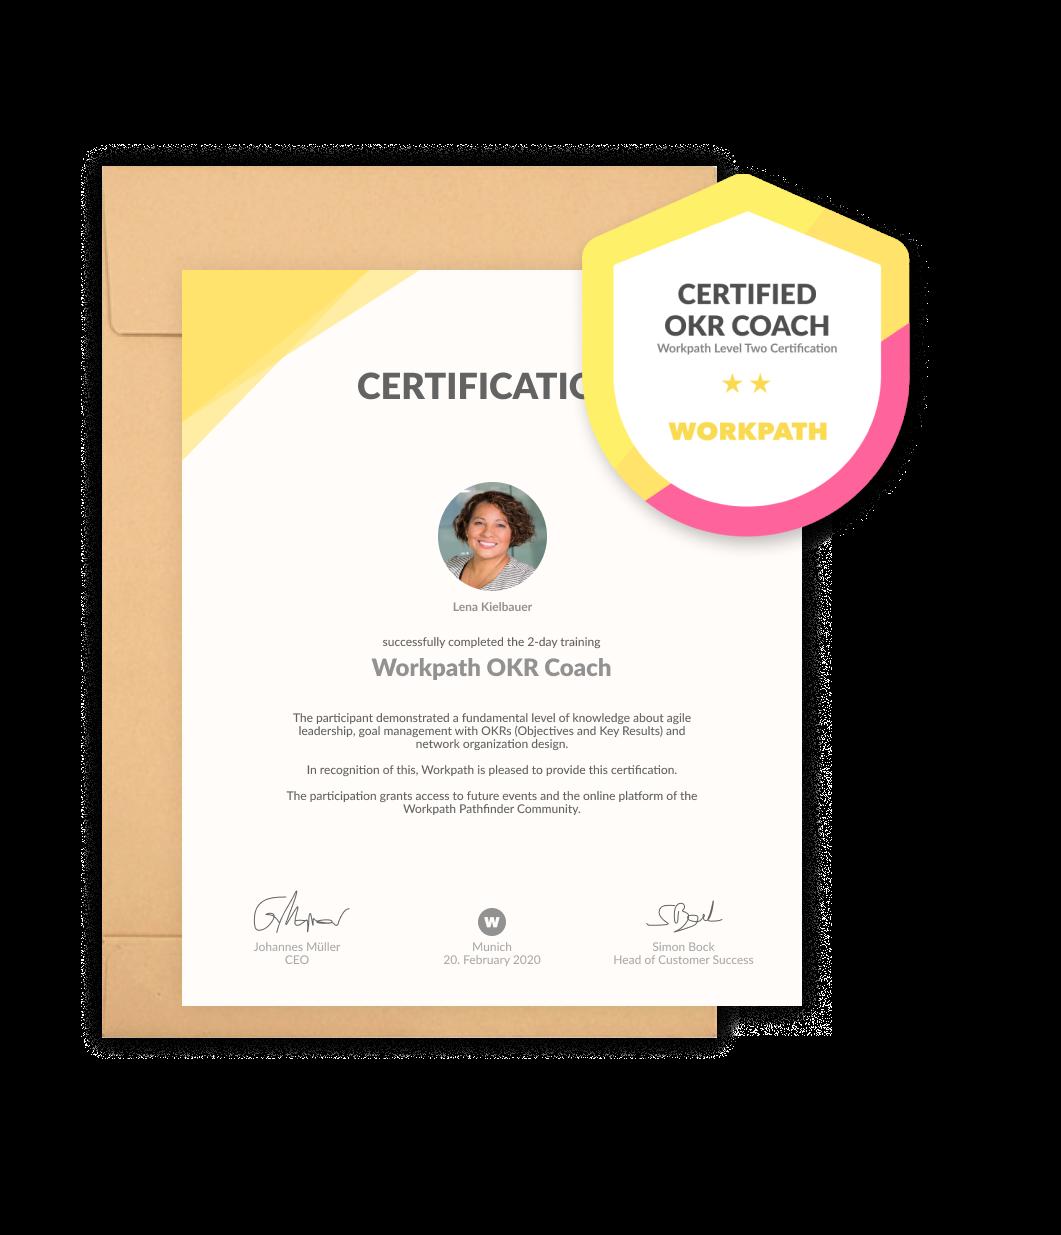 OKR Coach certification